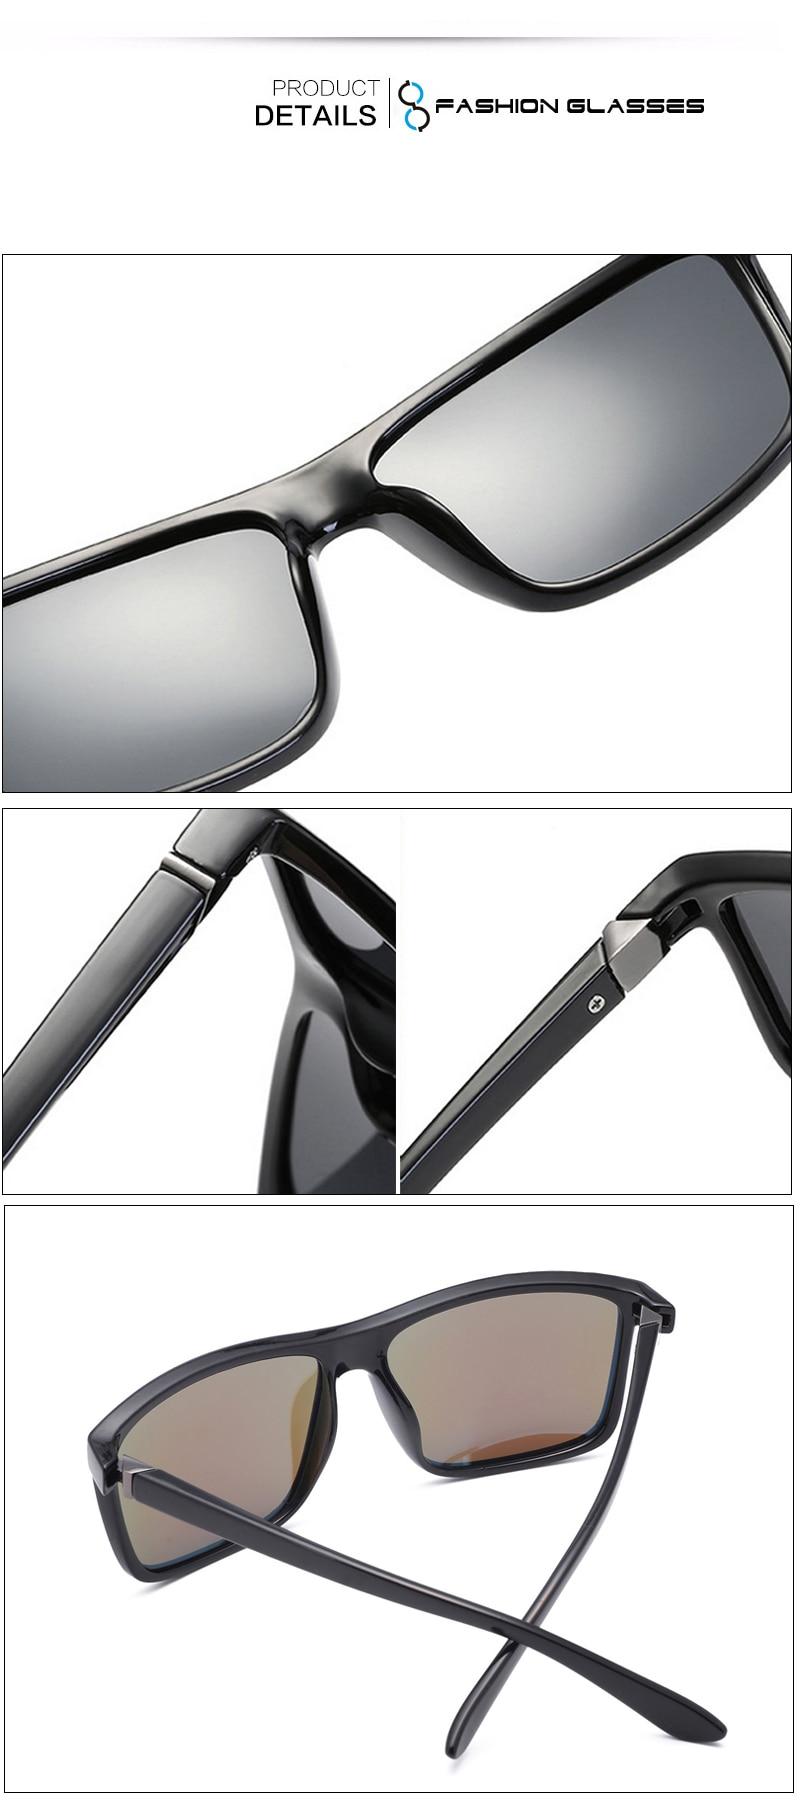 HTB1AhL4d4PI8KJjSspoq6x6MFXaq - FREE SHIPPING Vintage Style Sunglasses JKP419